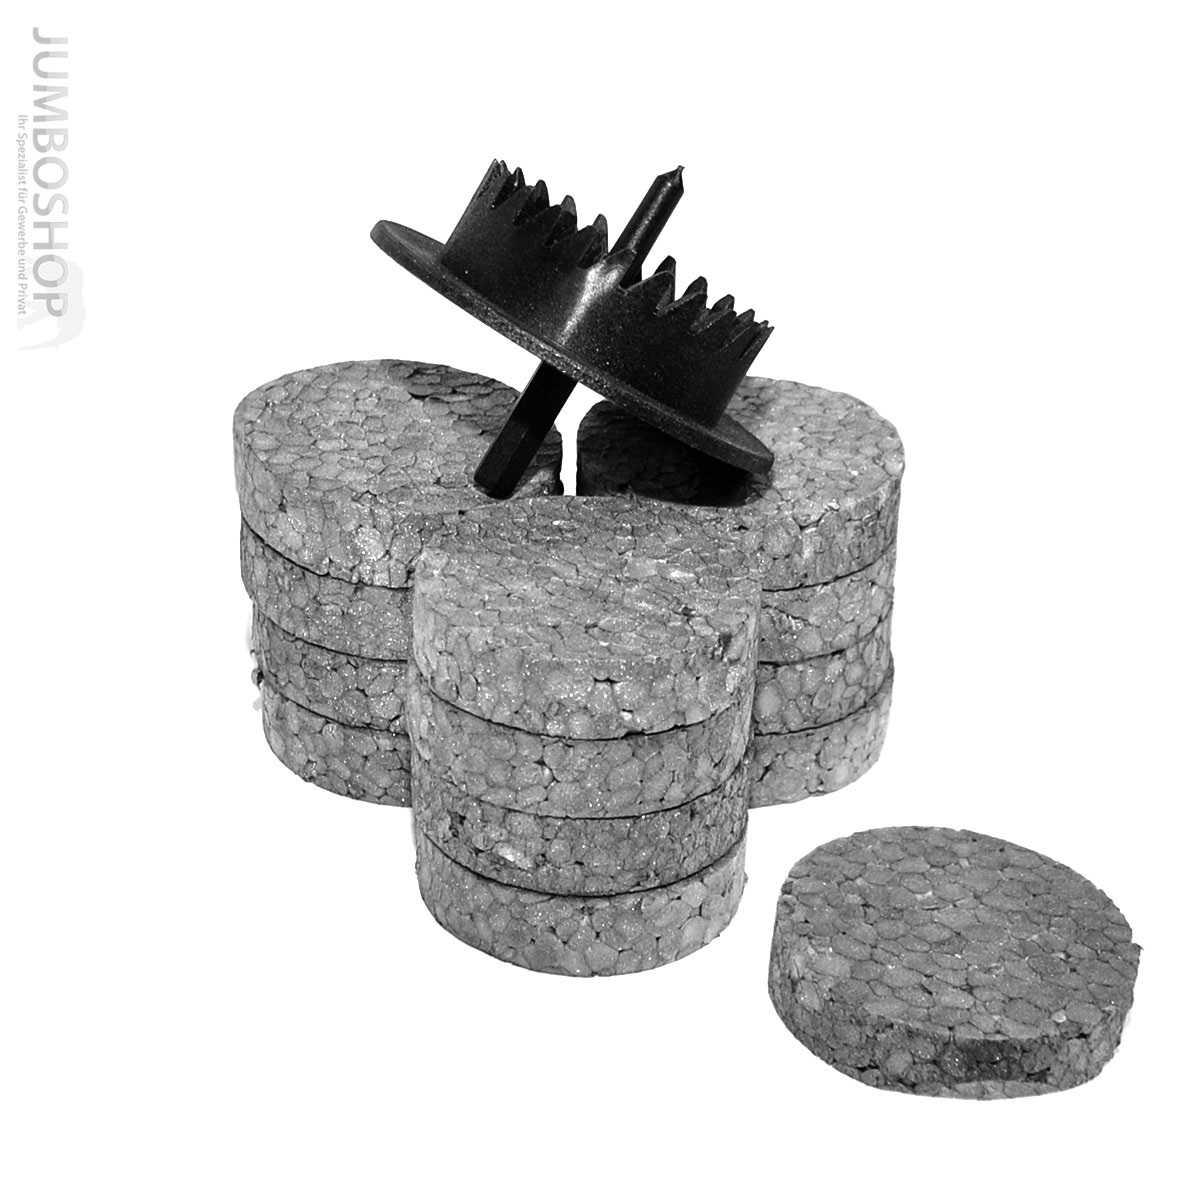 rondelle styropor graphit f r tellerd bel mit fr se wdvs d mmung isolierung wlg ebay. Black Bedroom Furniture Sets. Home Design Ideas